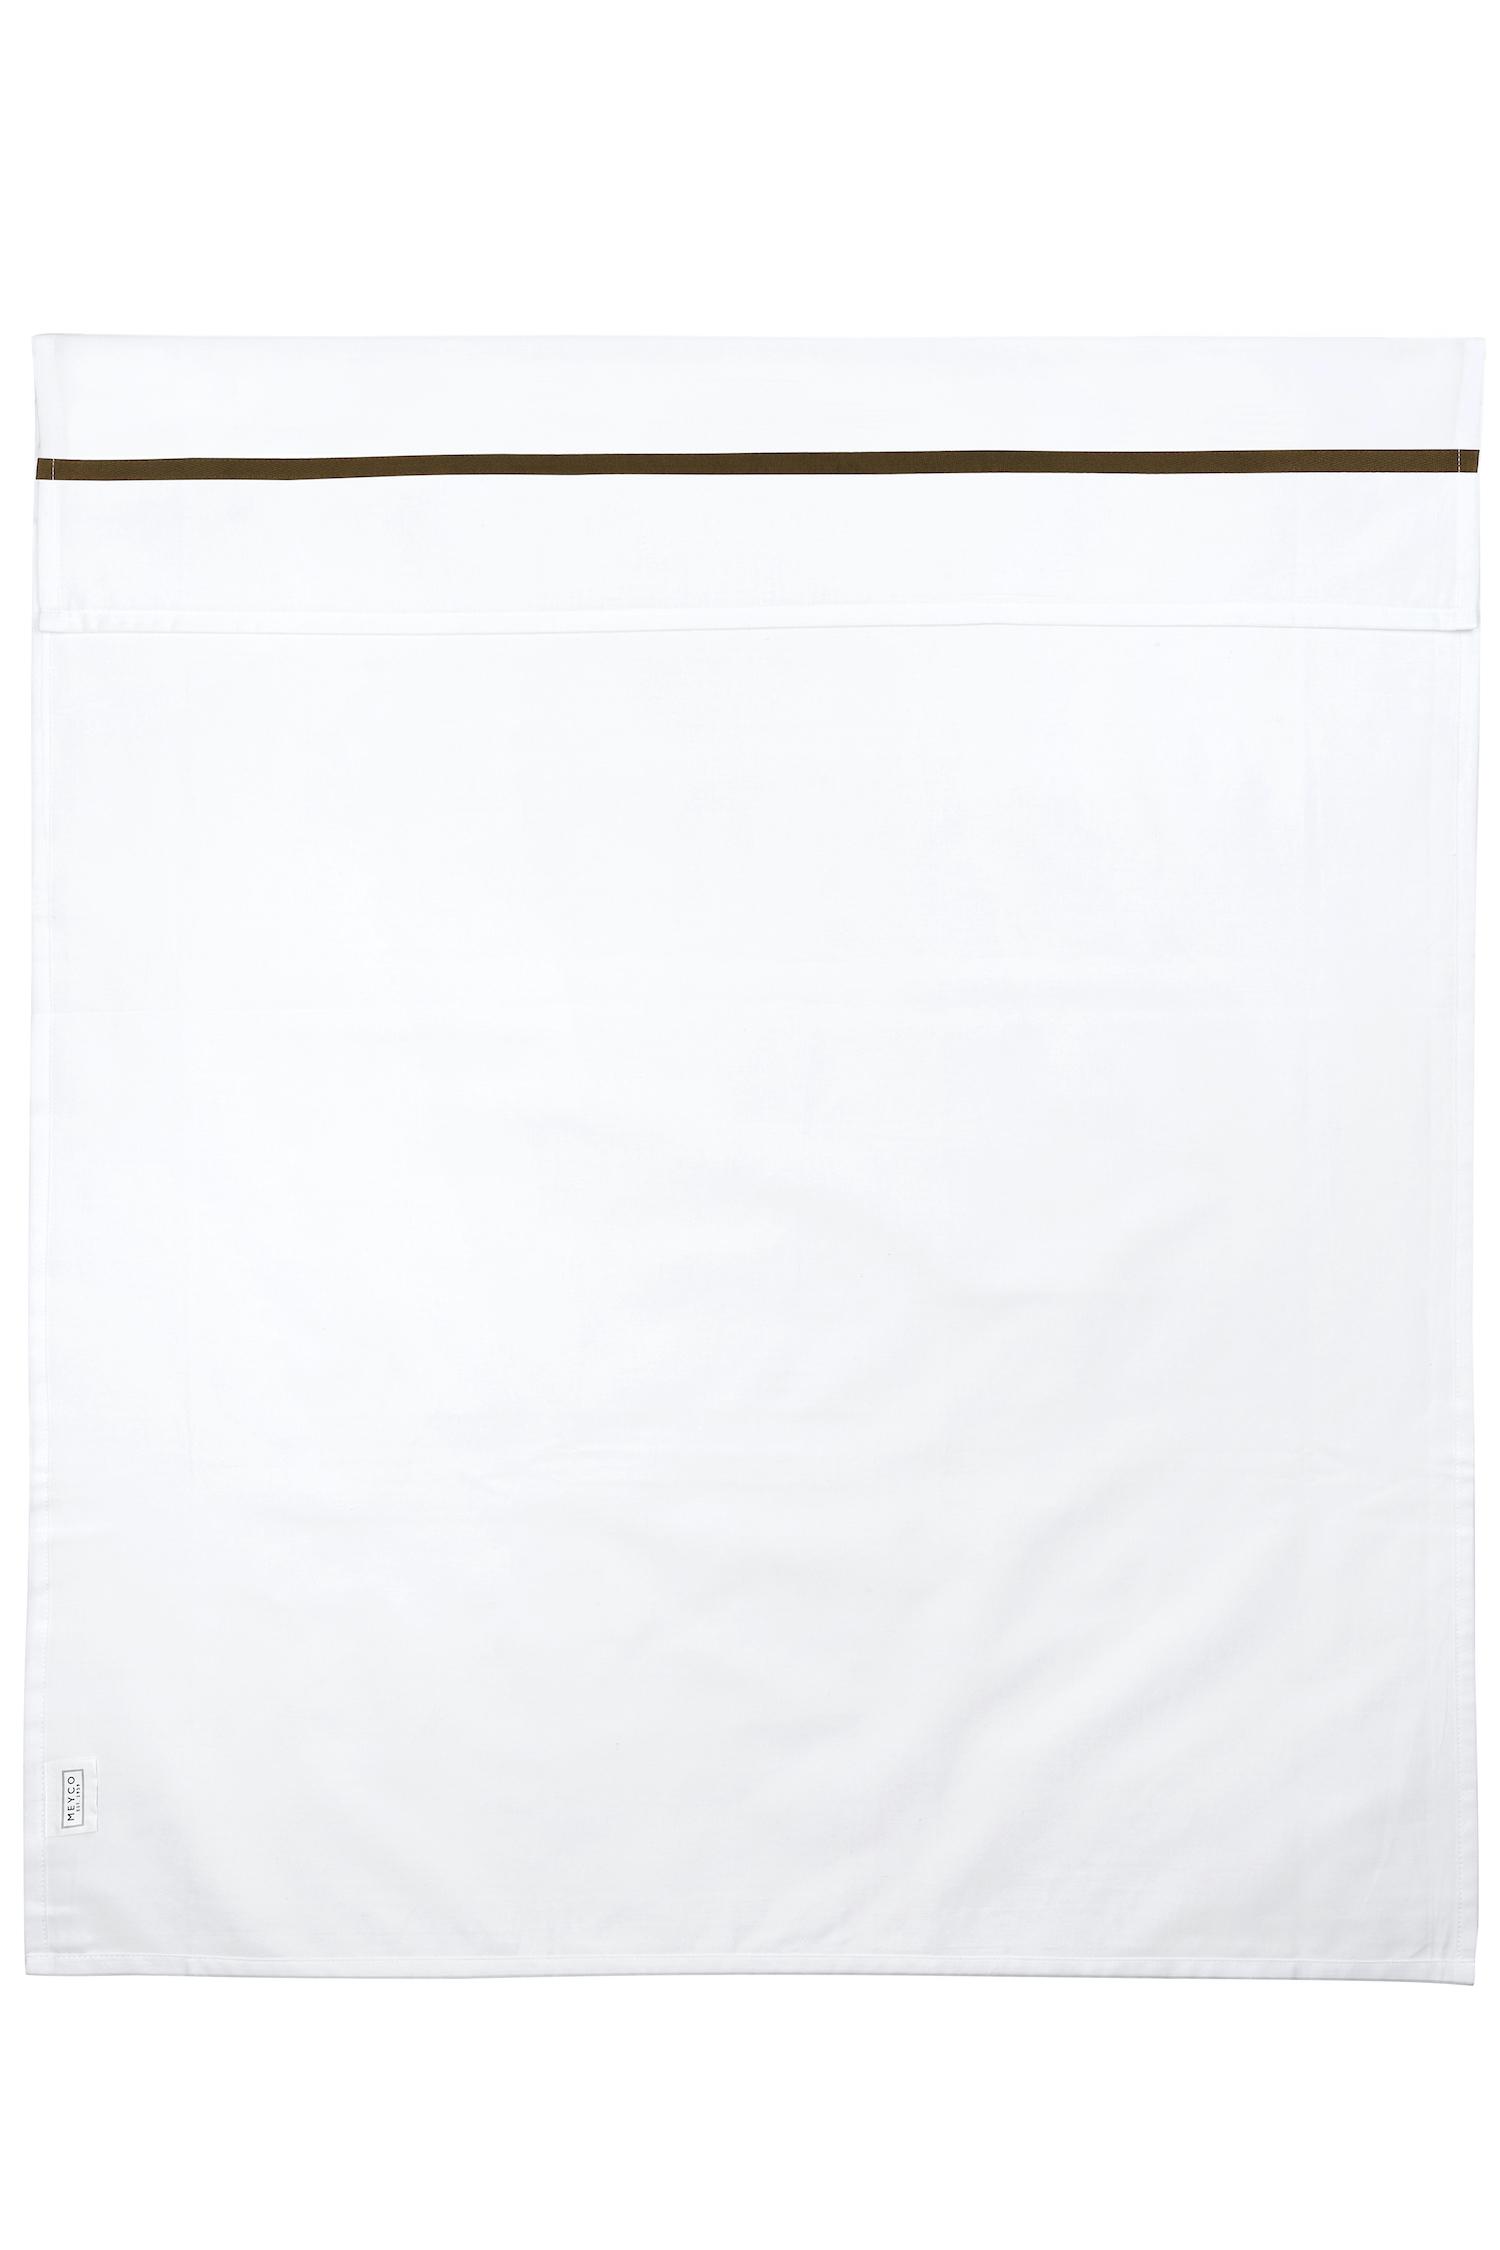 Wieglaken Bies - Chocolate - 75x100cm